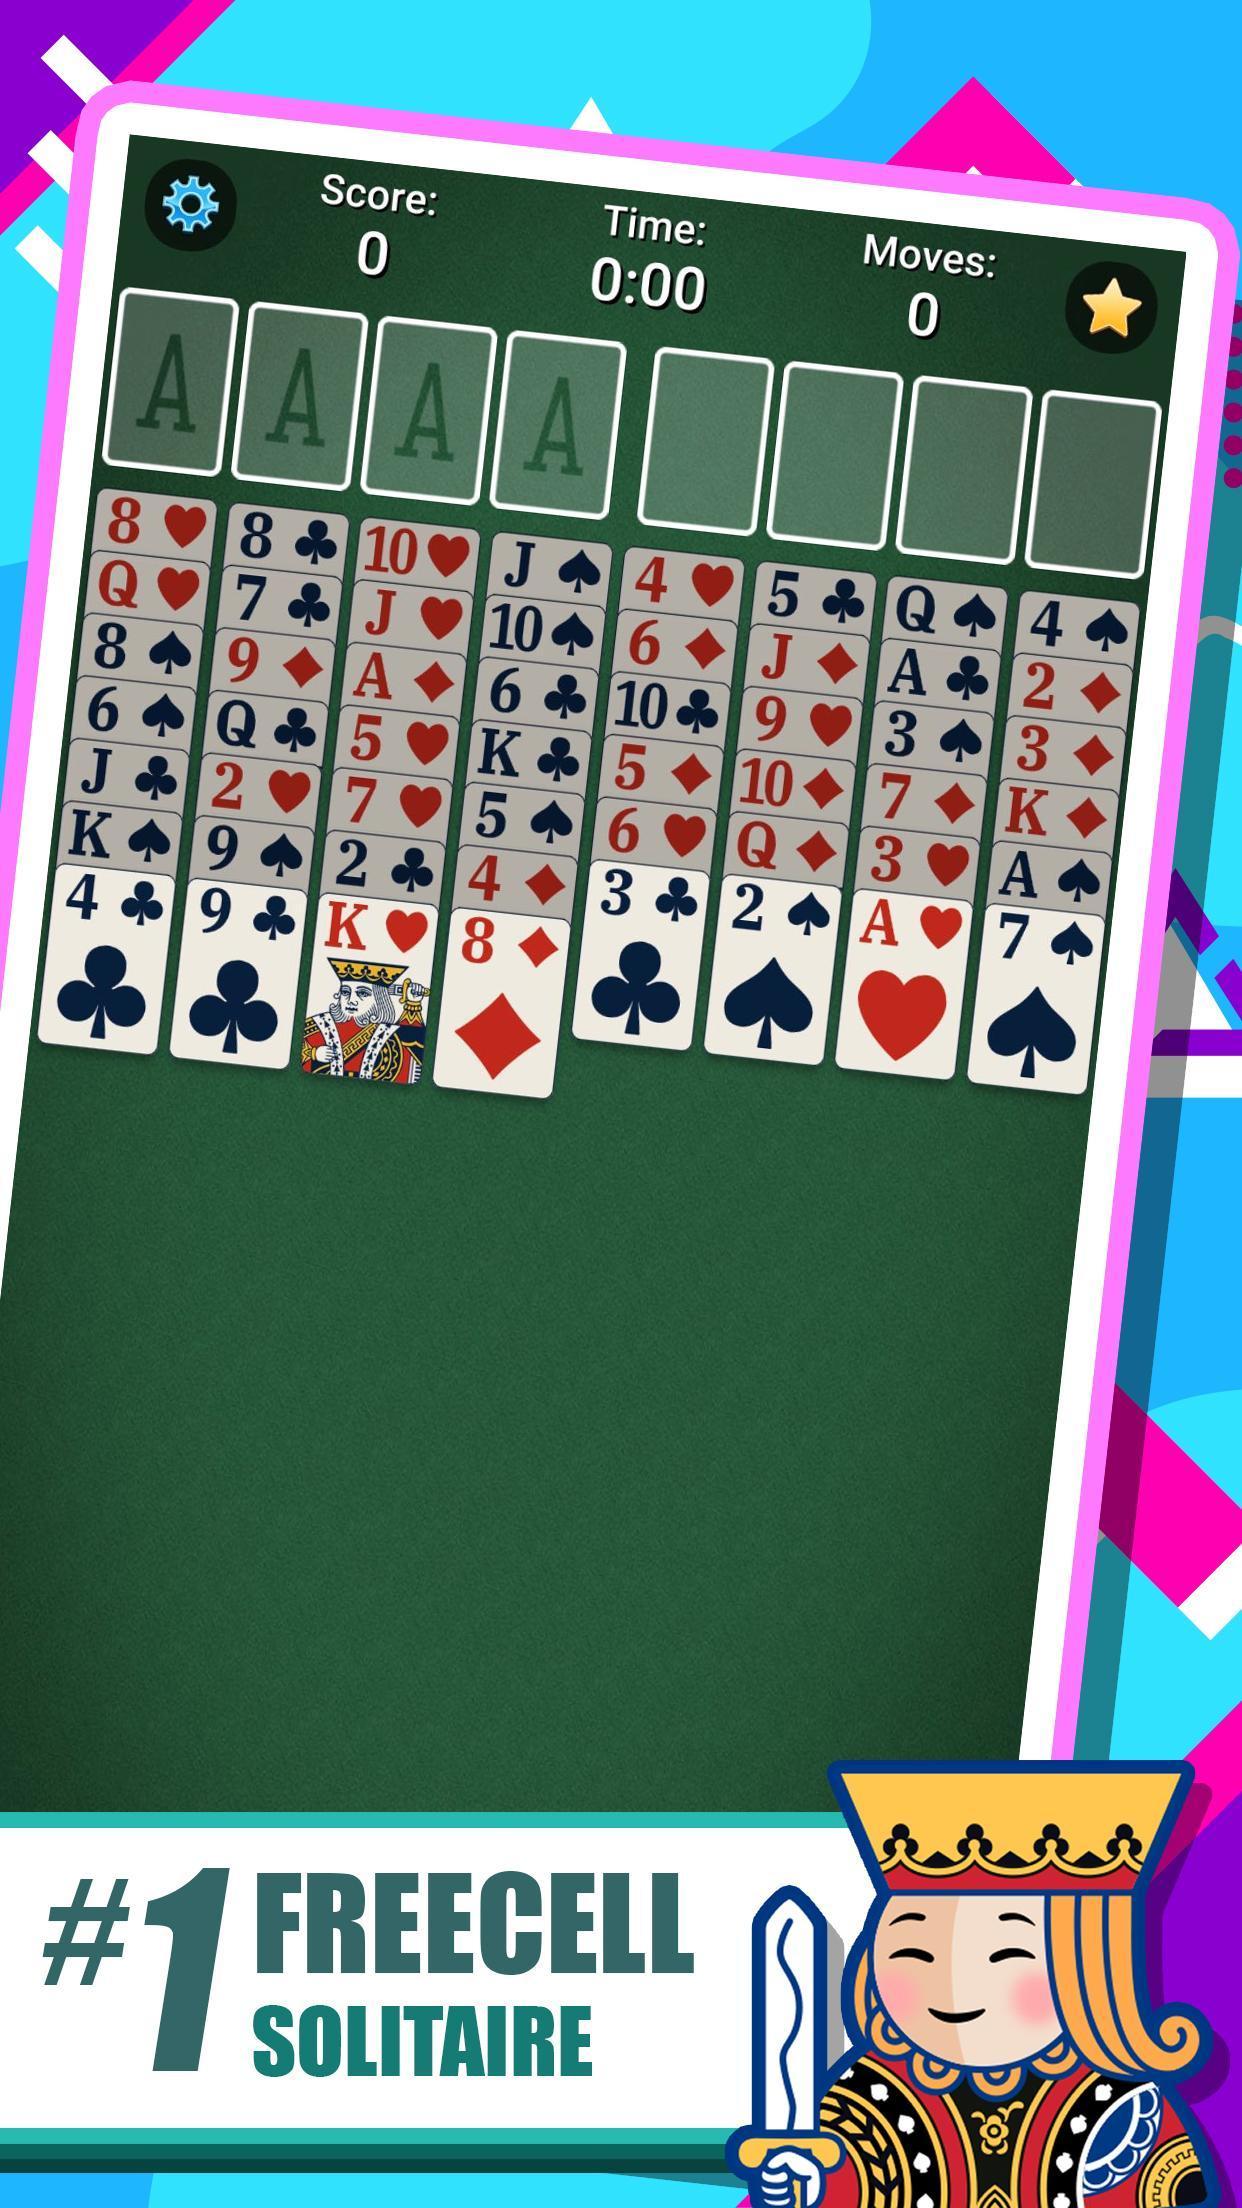 FreeCell Solitaire 5.4.0.3366 Screenshot 1